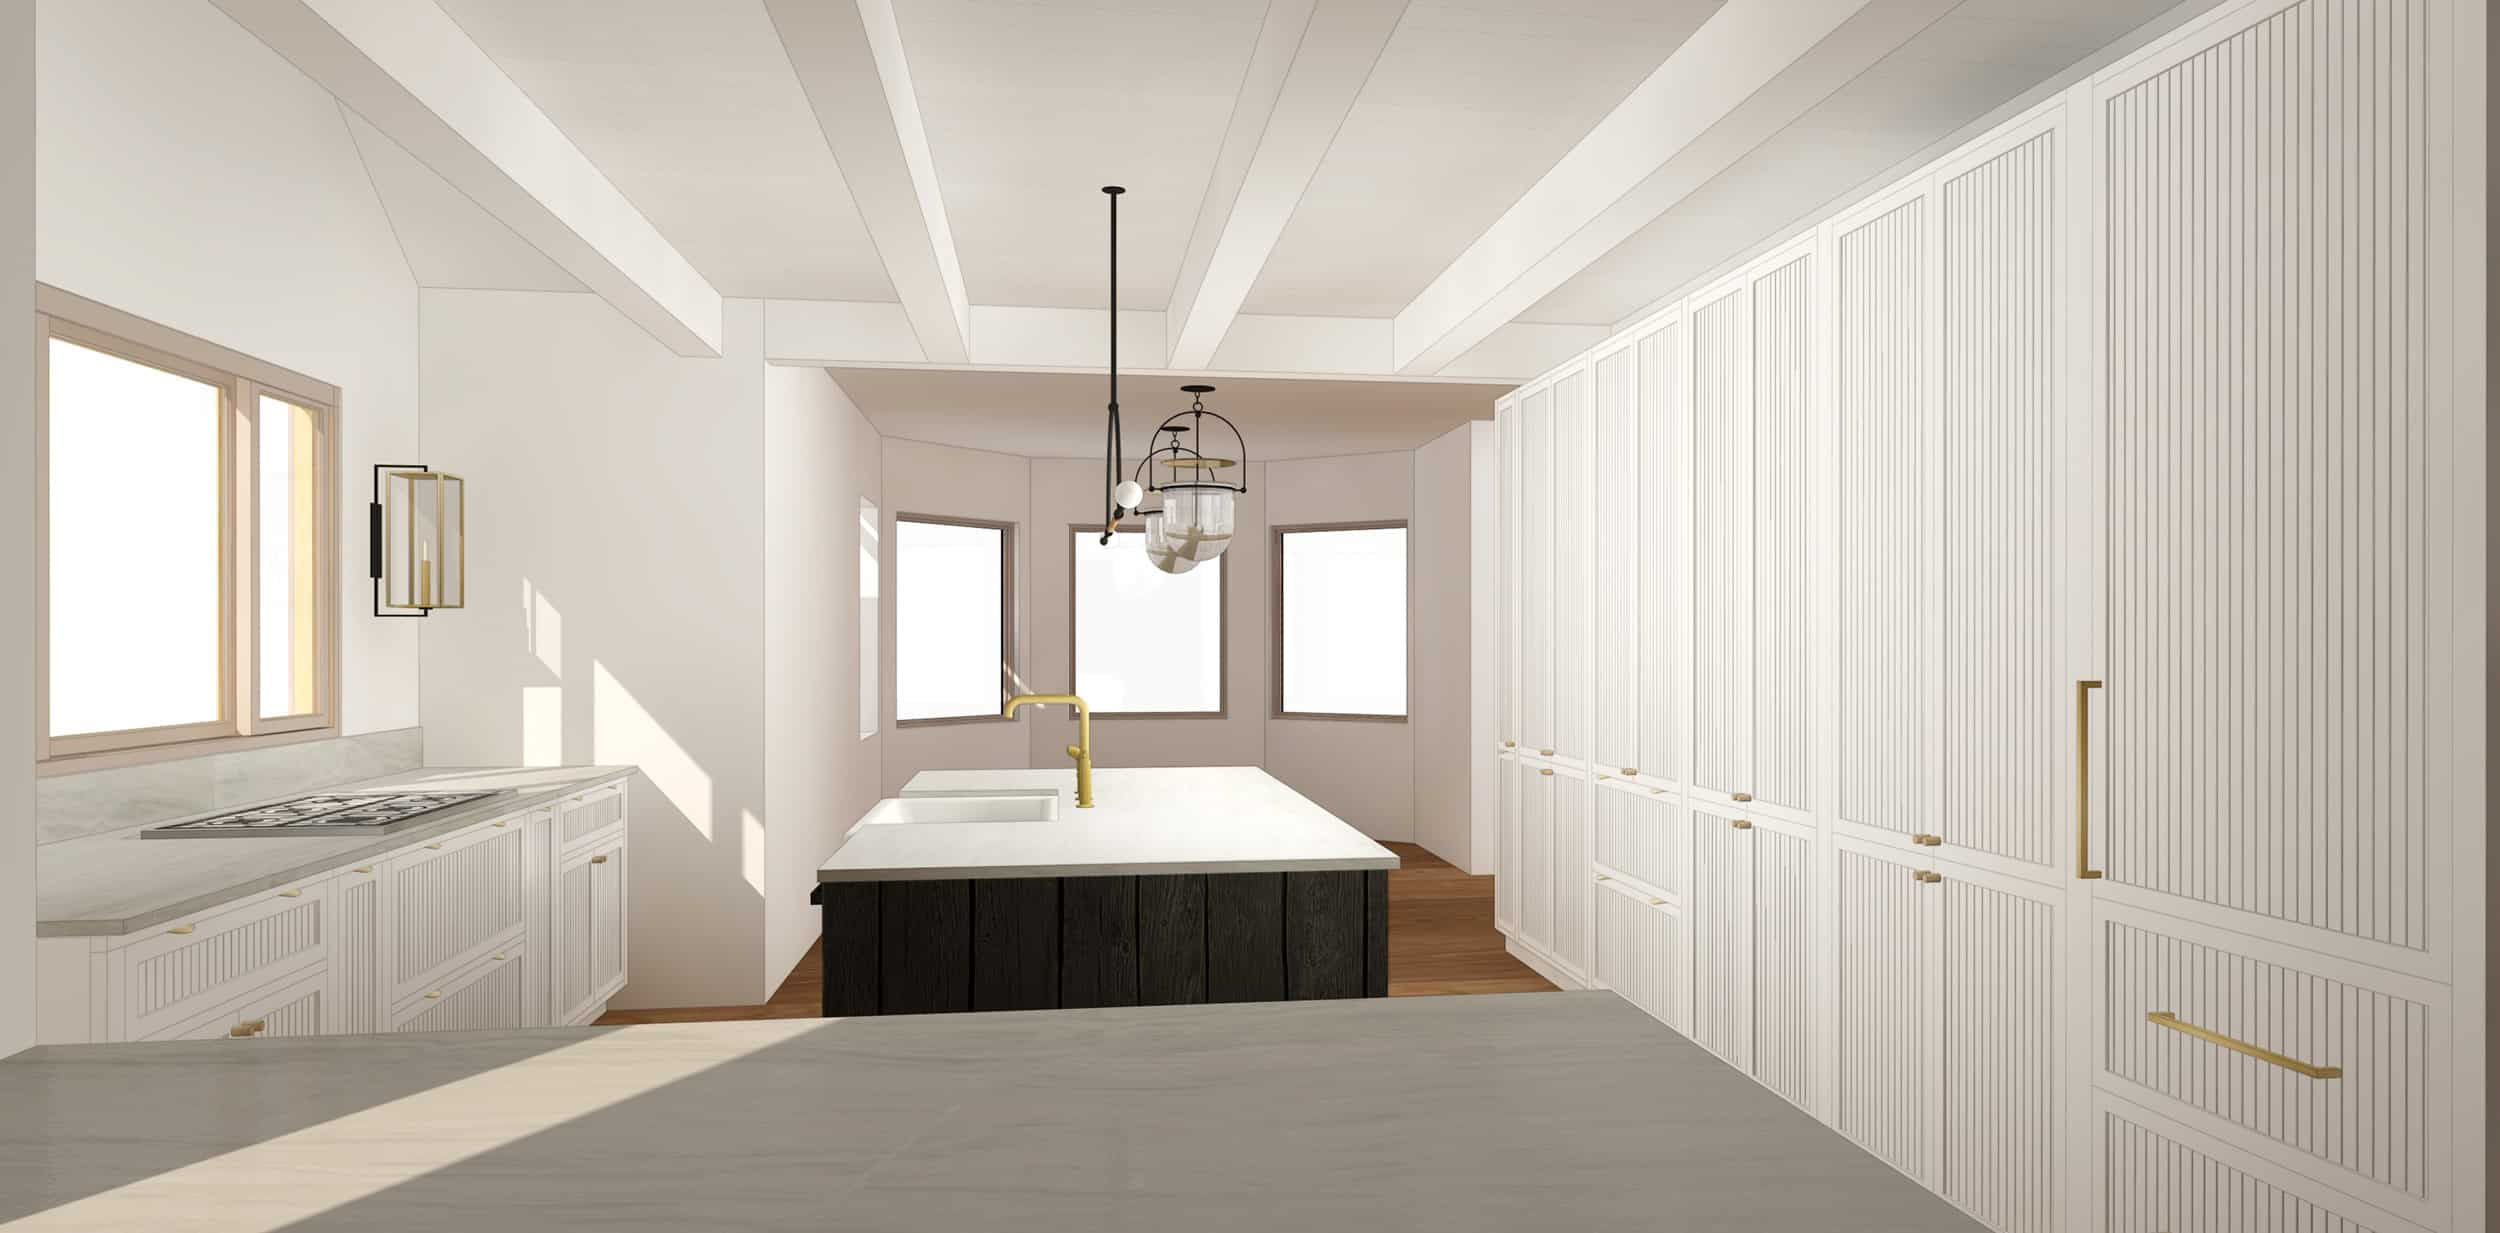 Emily Henderson Mountain House Kitchen Evolution Kitchensumnt Grooved Shaker 01 Final